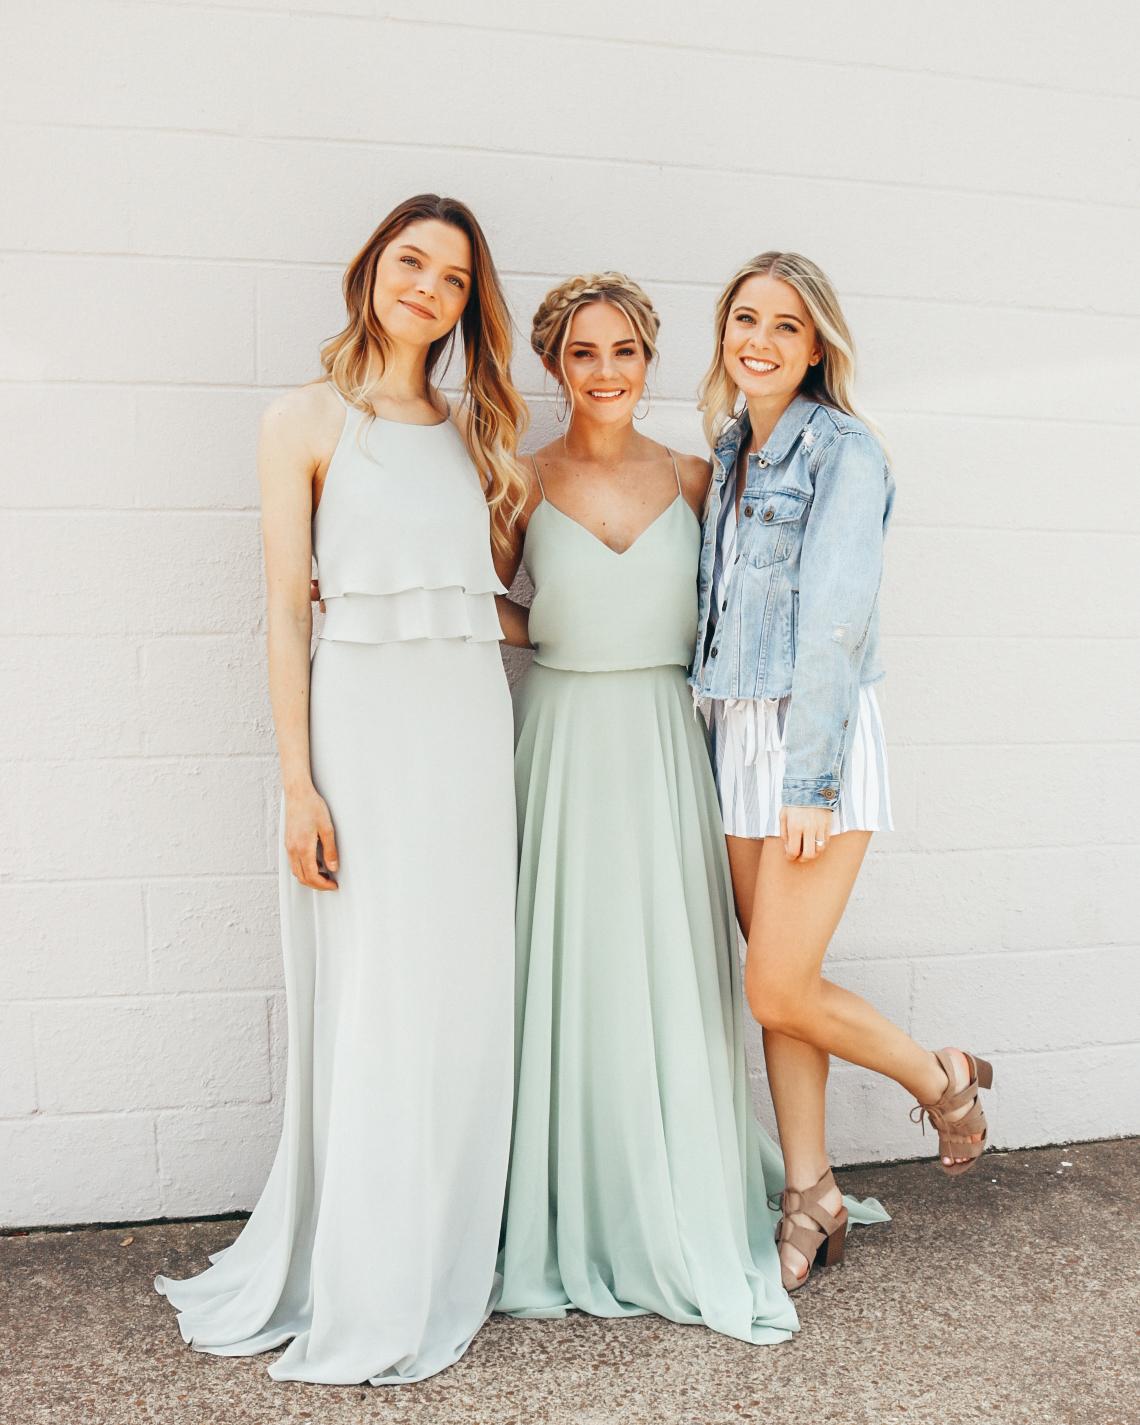 bella bridesmaids-3.jpg